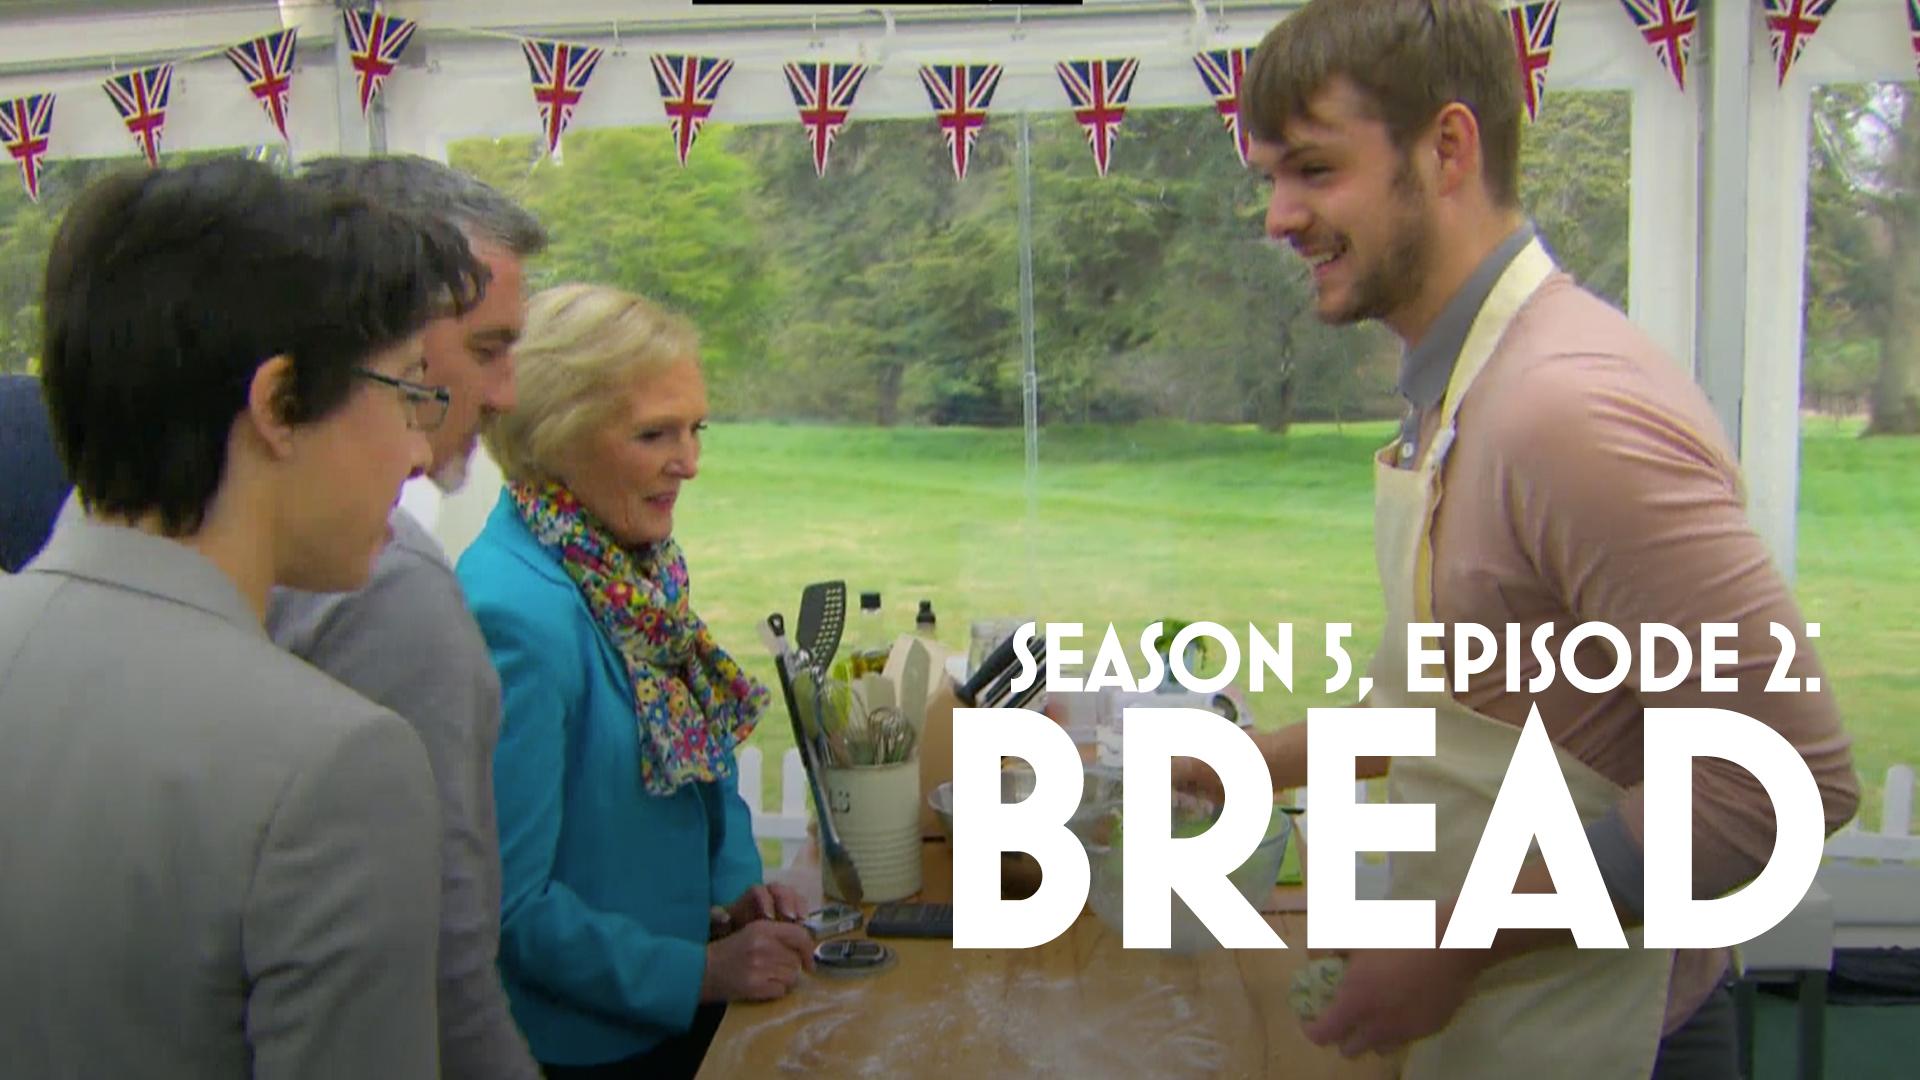 Episode 2: Bread